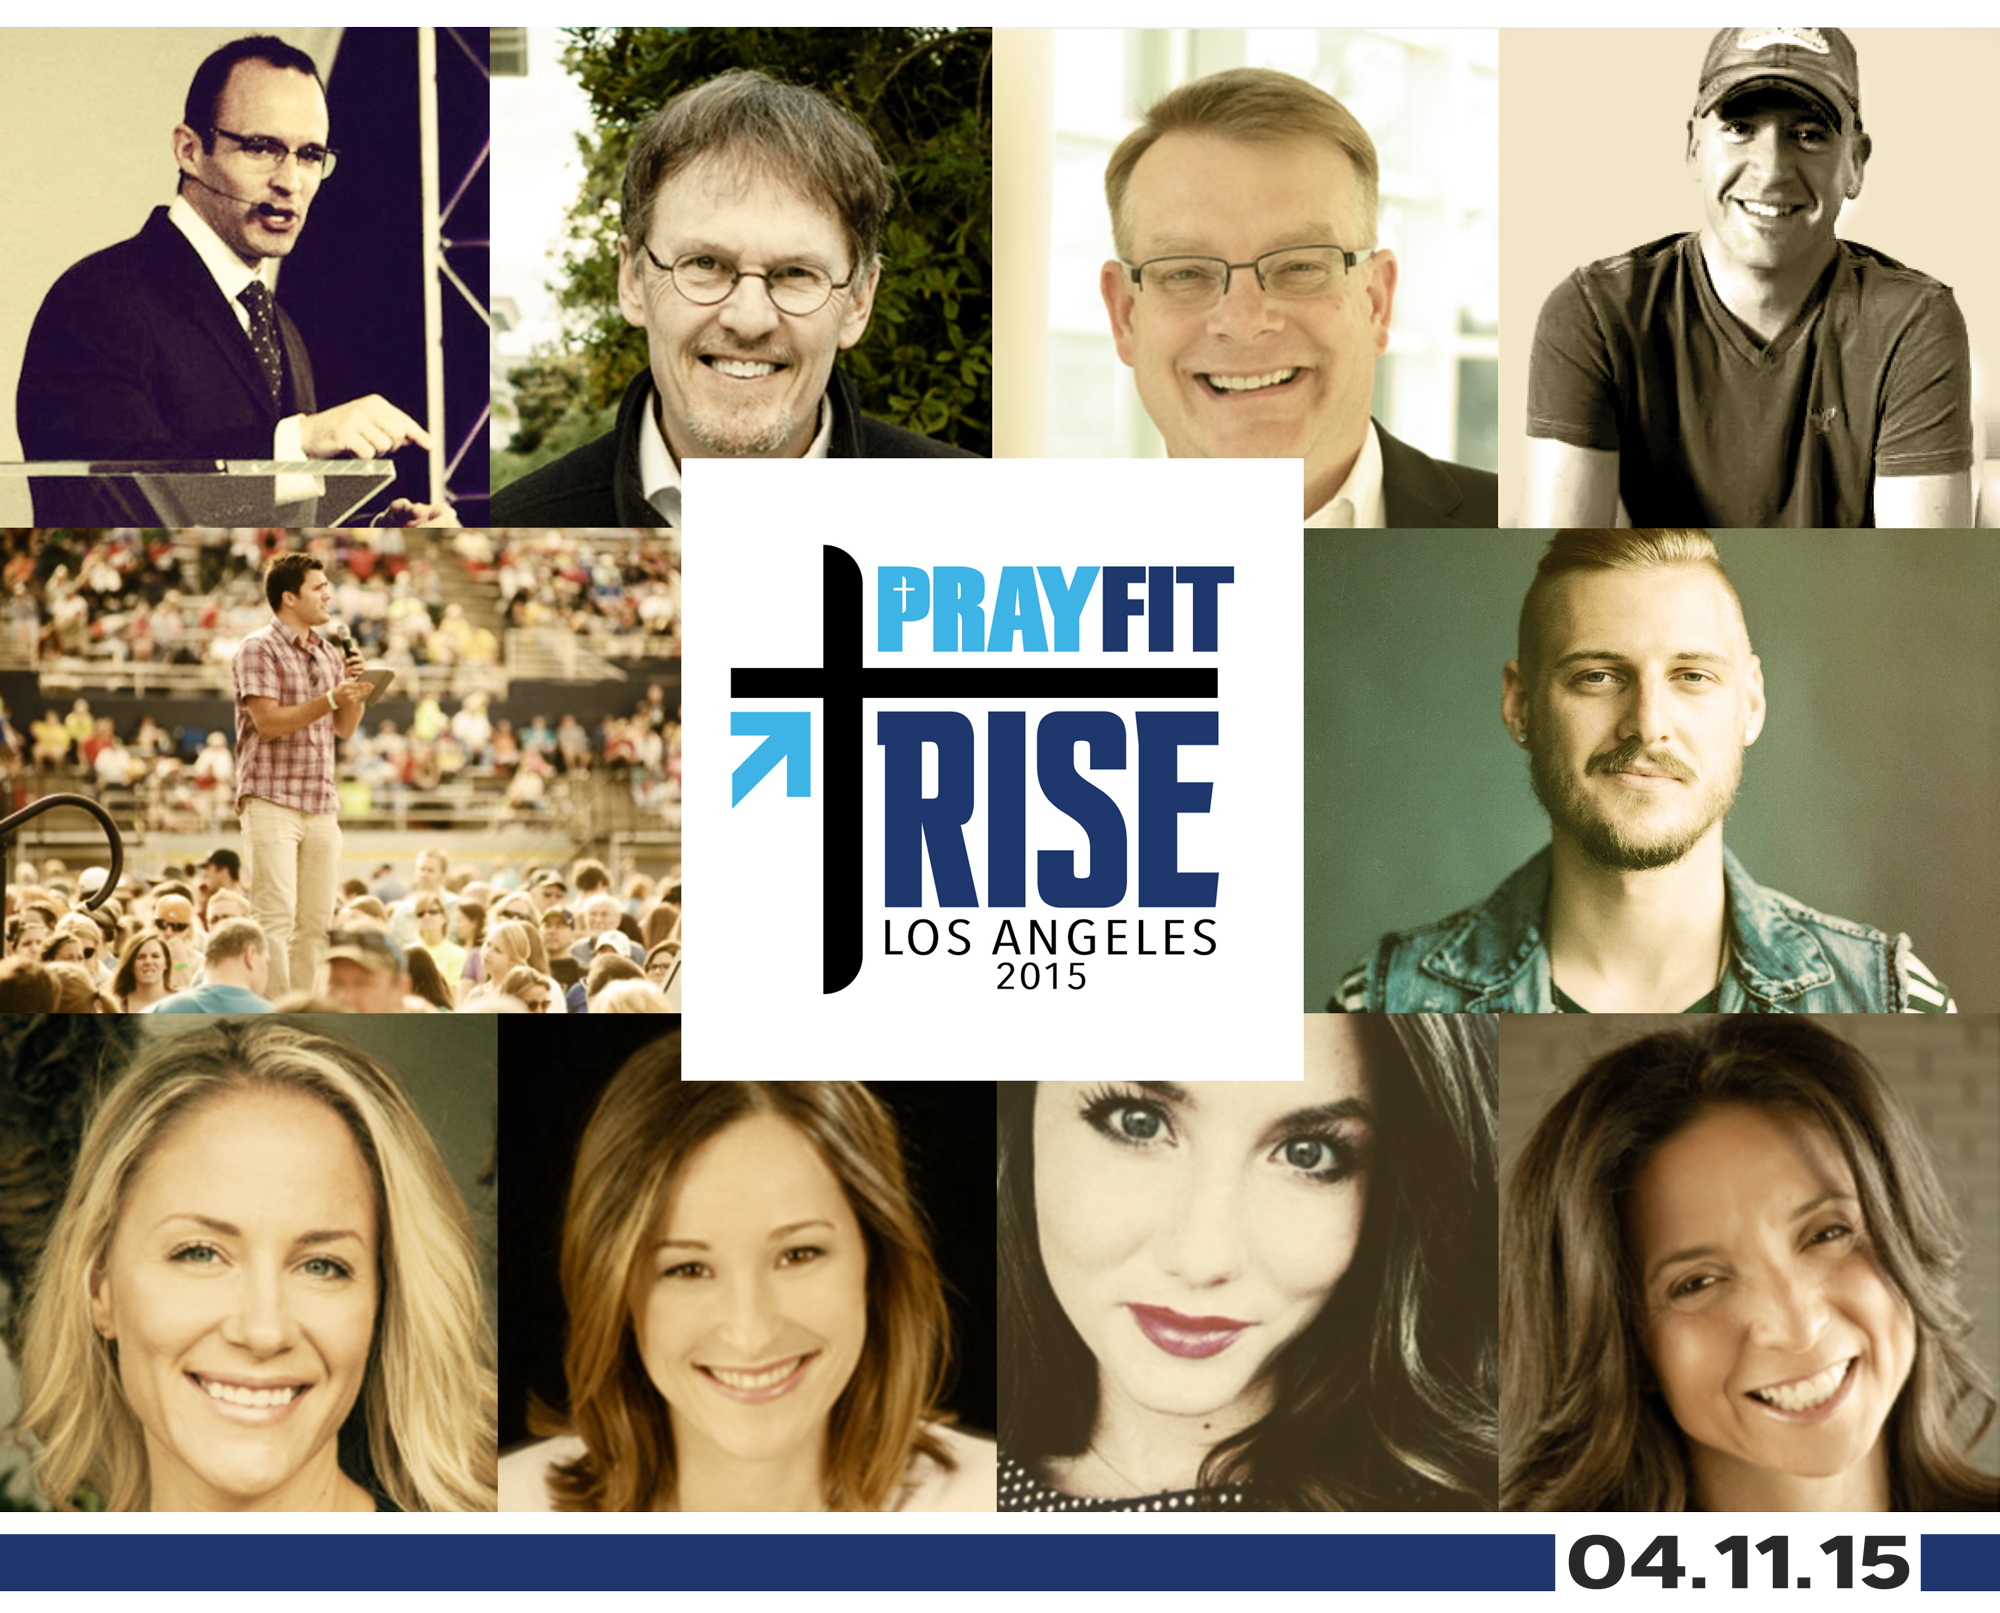 PRAYFIT-RISE-SPEAKERS-TONEDb-010515